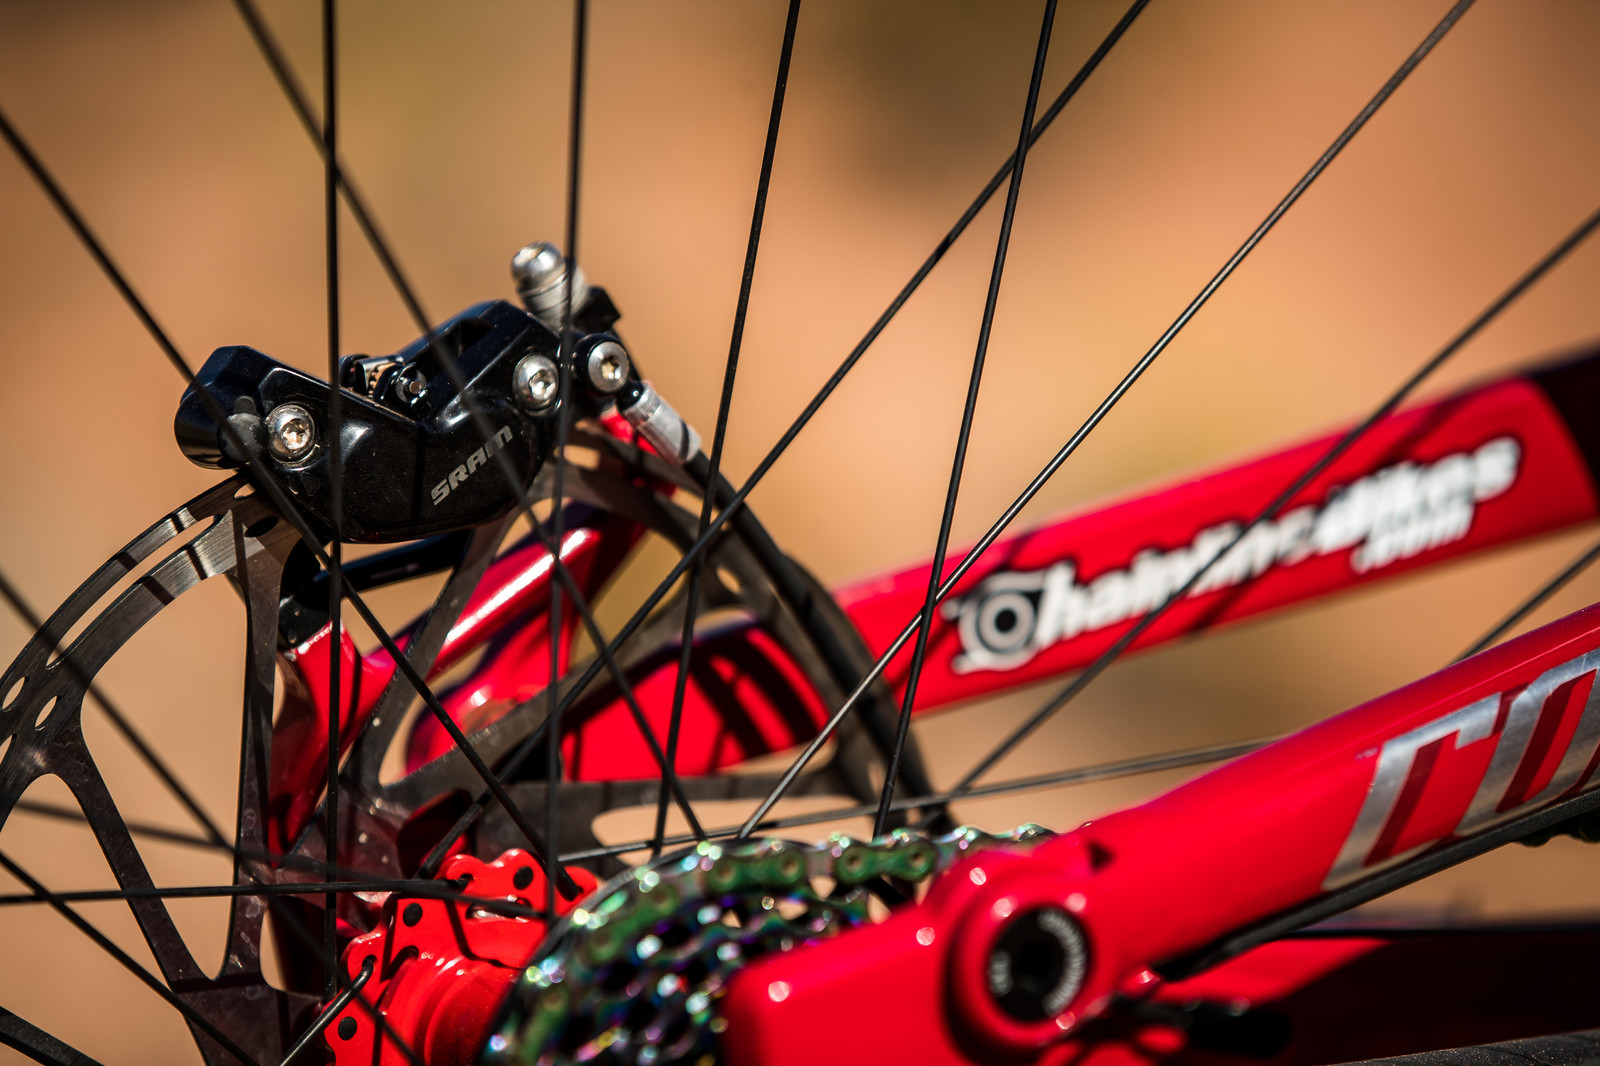 SRAM Code on Kyle Strait's 2019 Commencal Furious Rampage Bike - RAMPAGE BIKE - Kyle Strait's Commencal Furious - Mountain Biking Pictures - Vital MTB